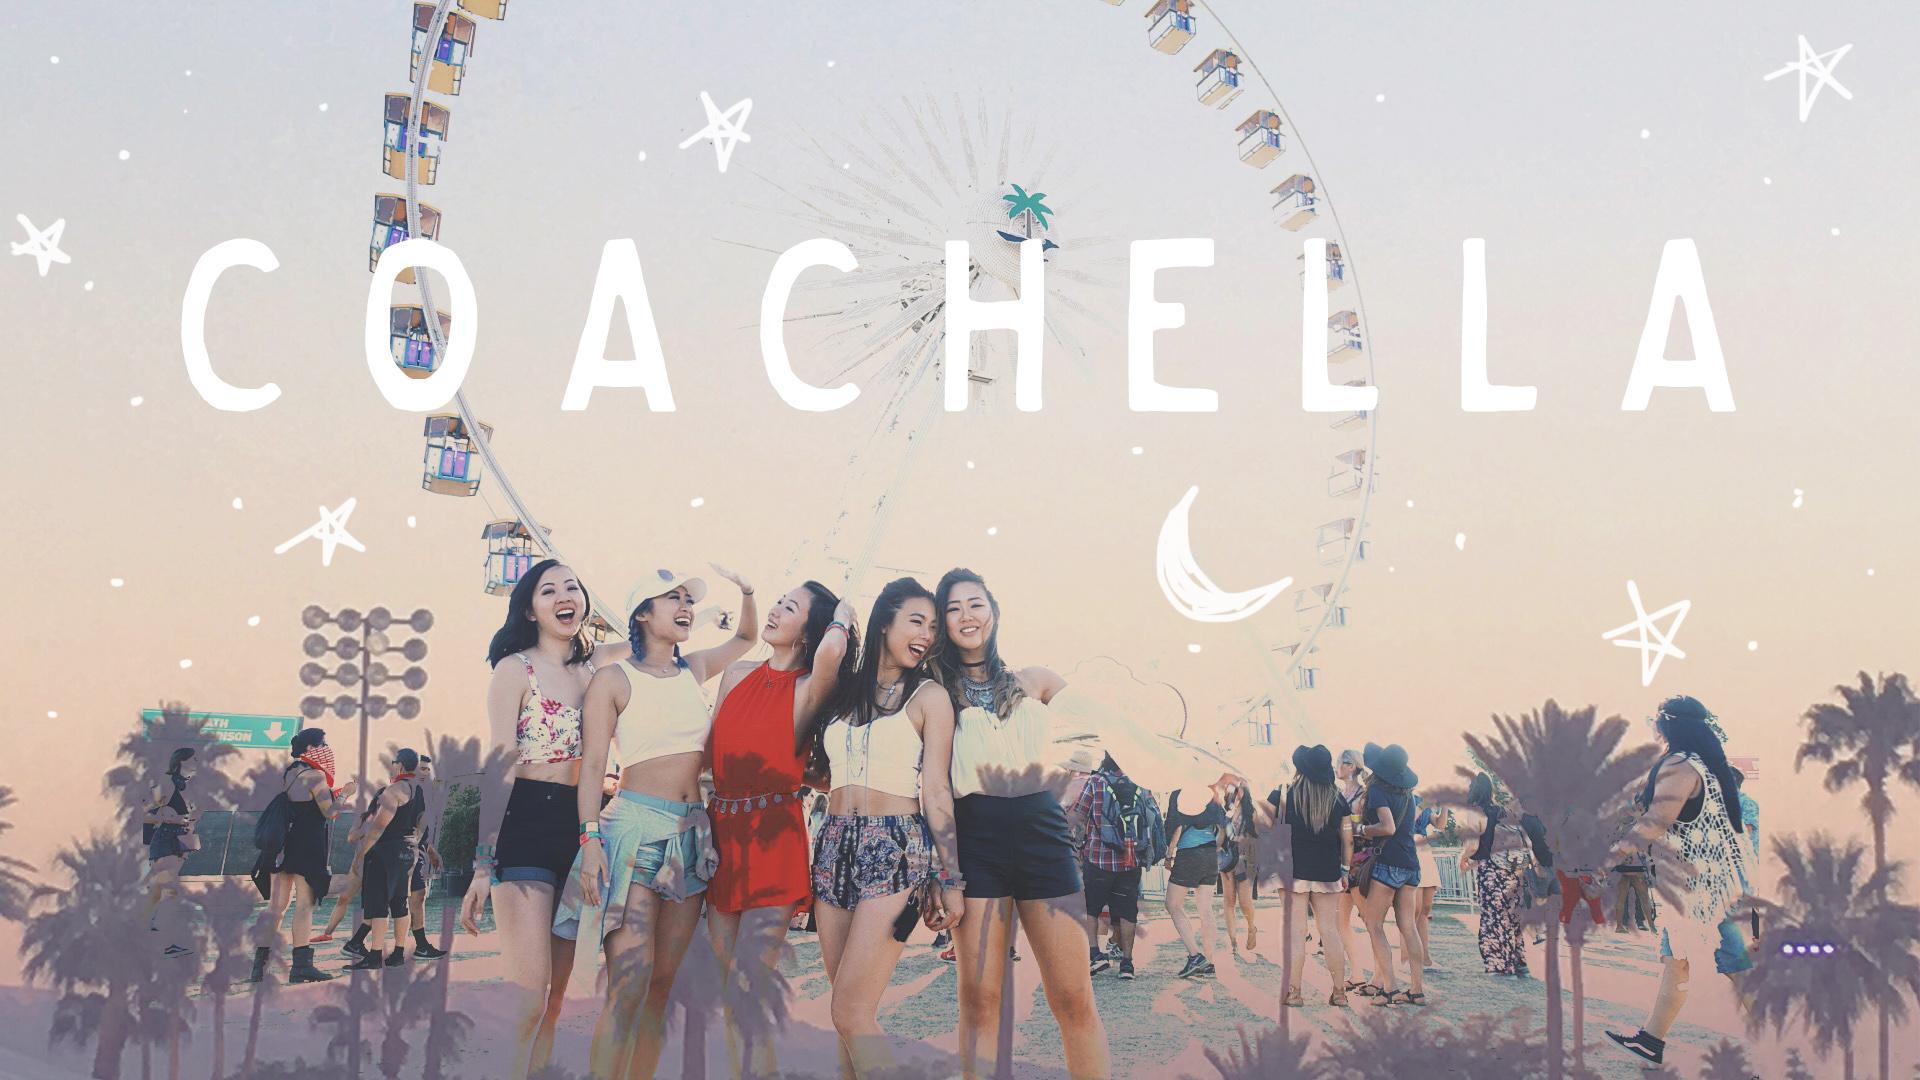 Coachella vlog